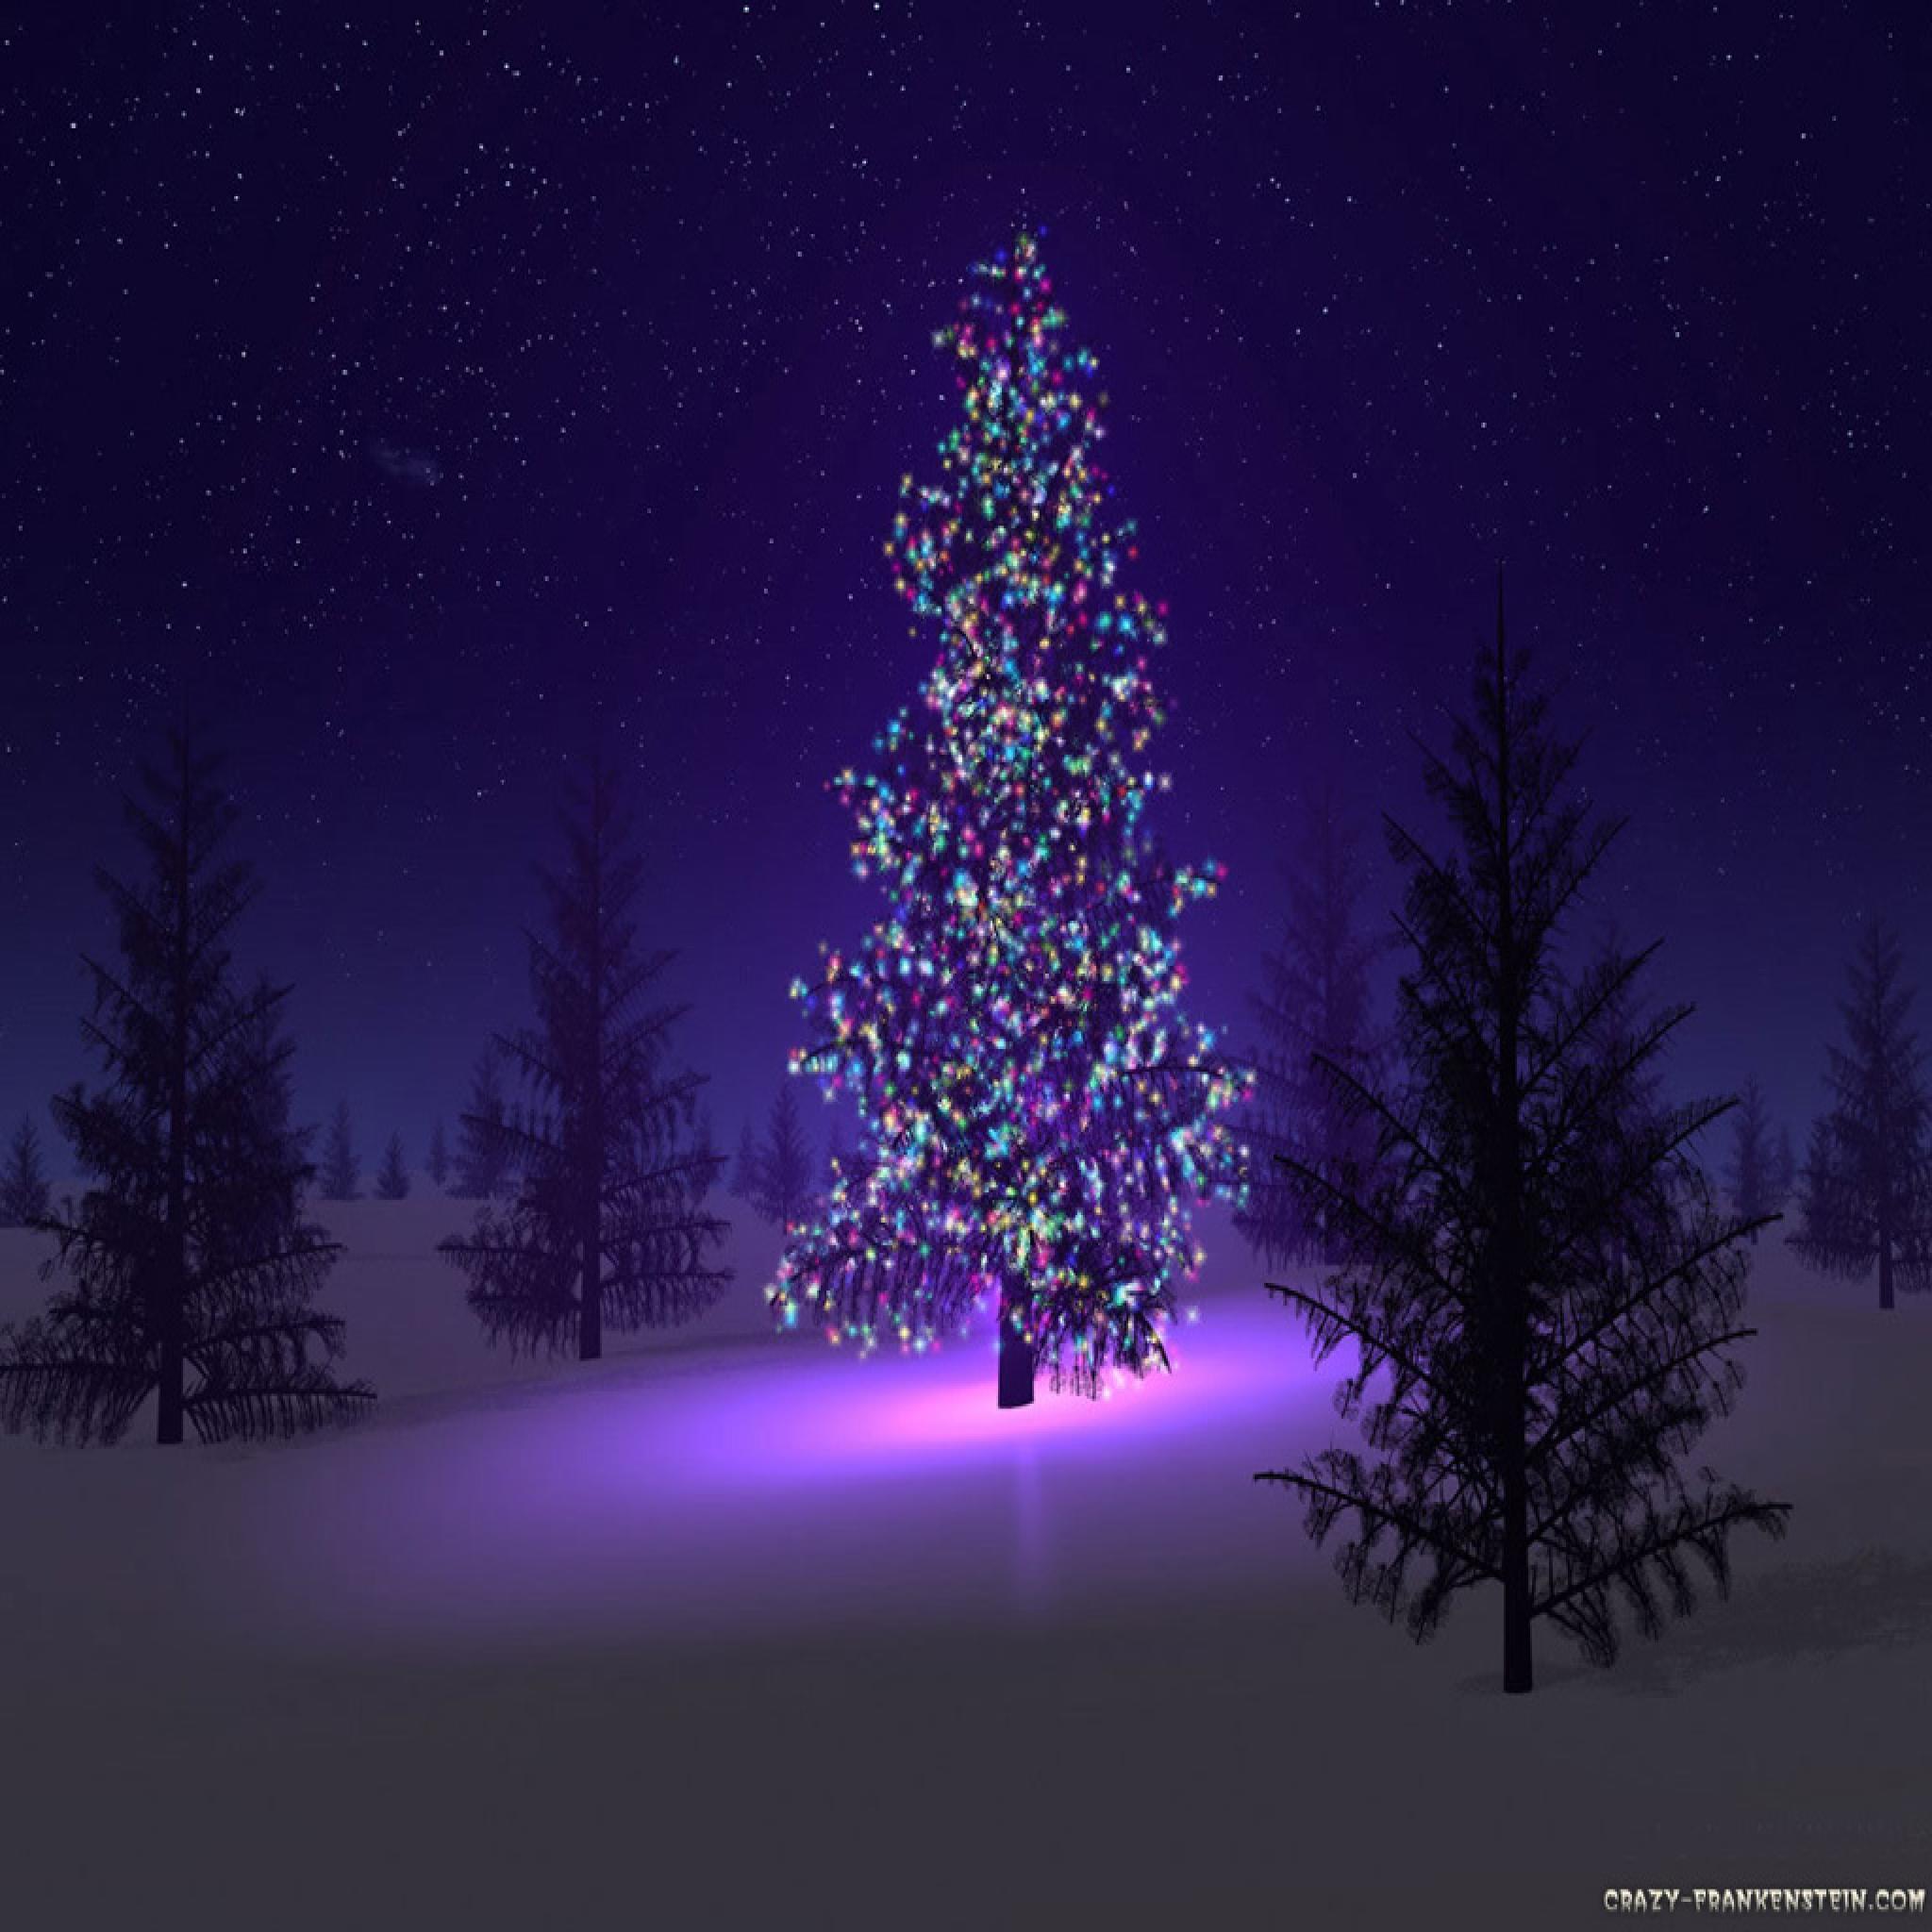 66+ Christmas Night Wallpaper on WallpaperSafari